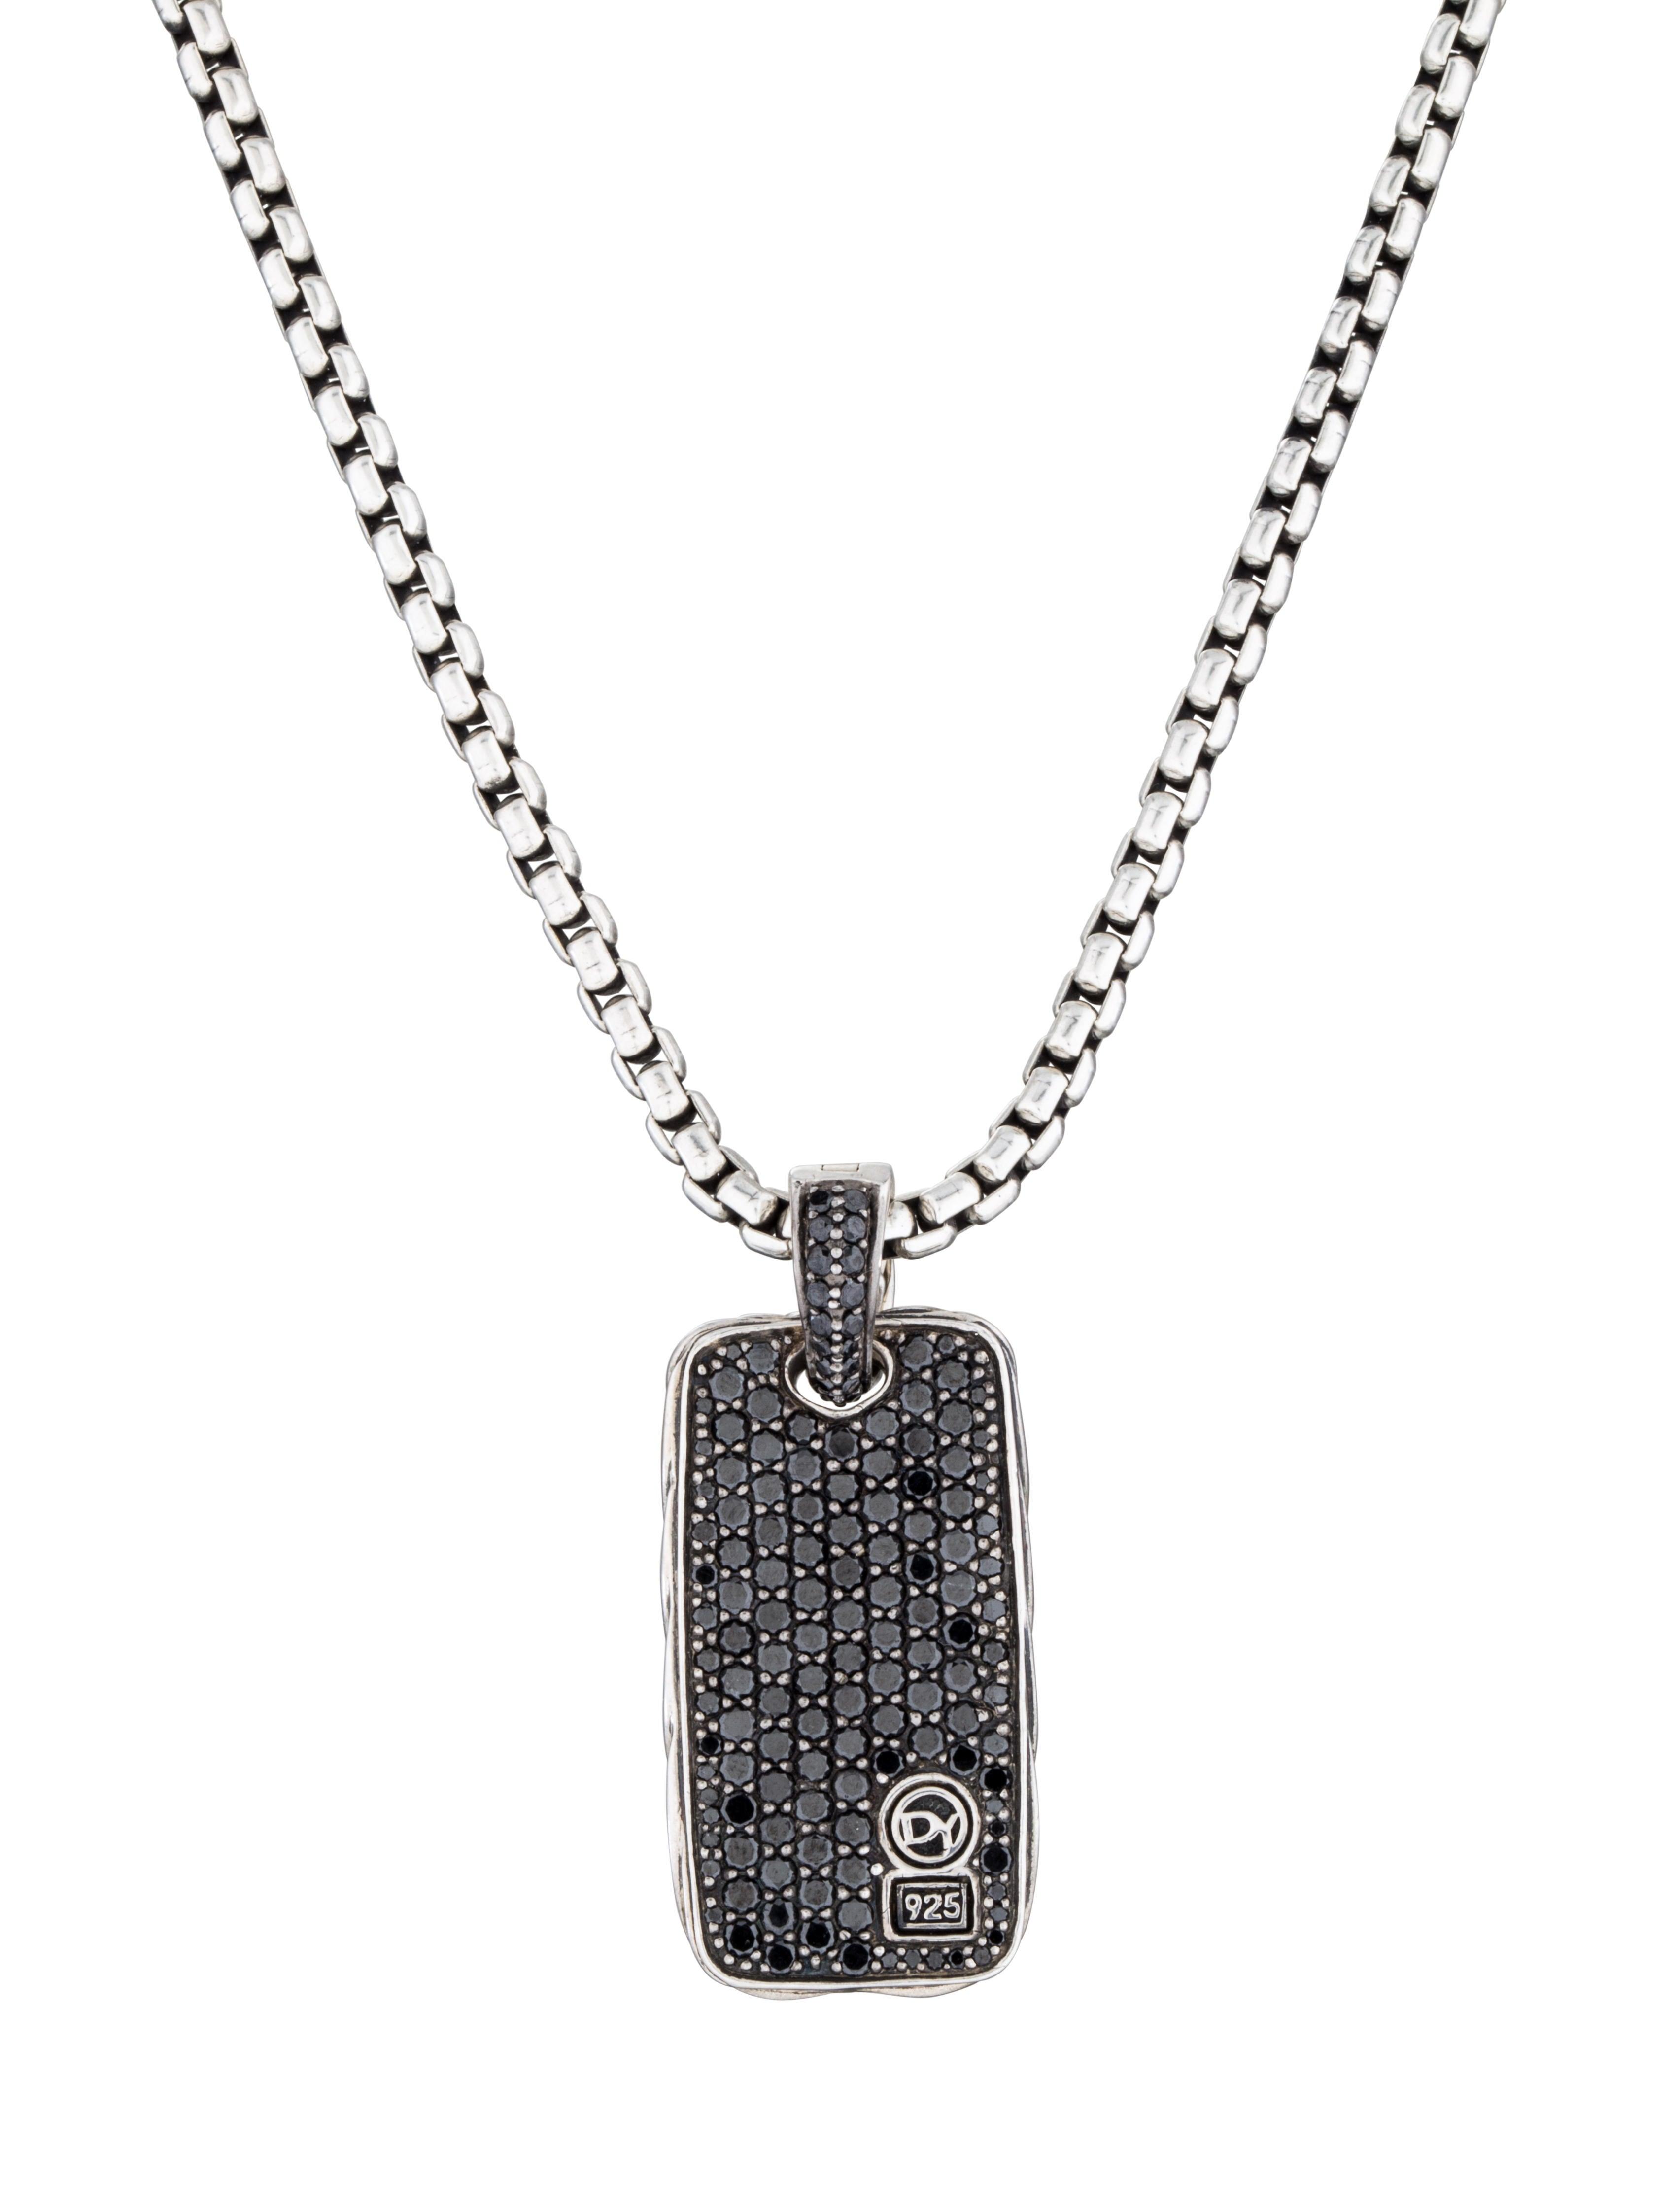 David Yurman Black Diamond Dog Tag Necklace Necklaces DVY